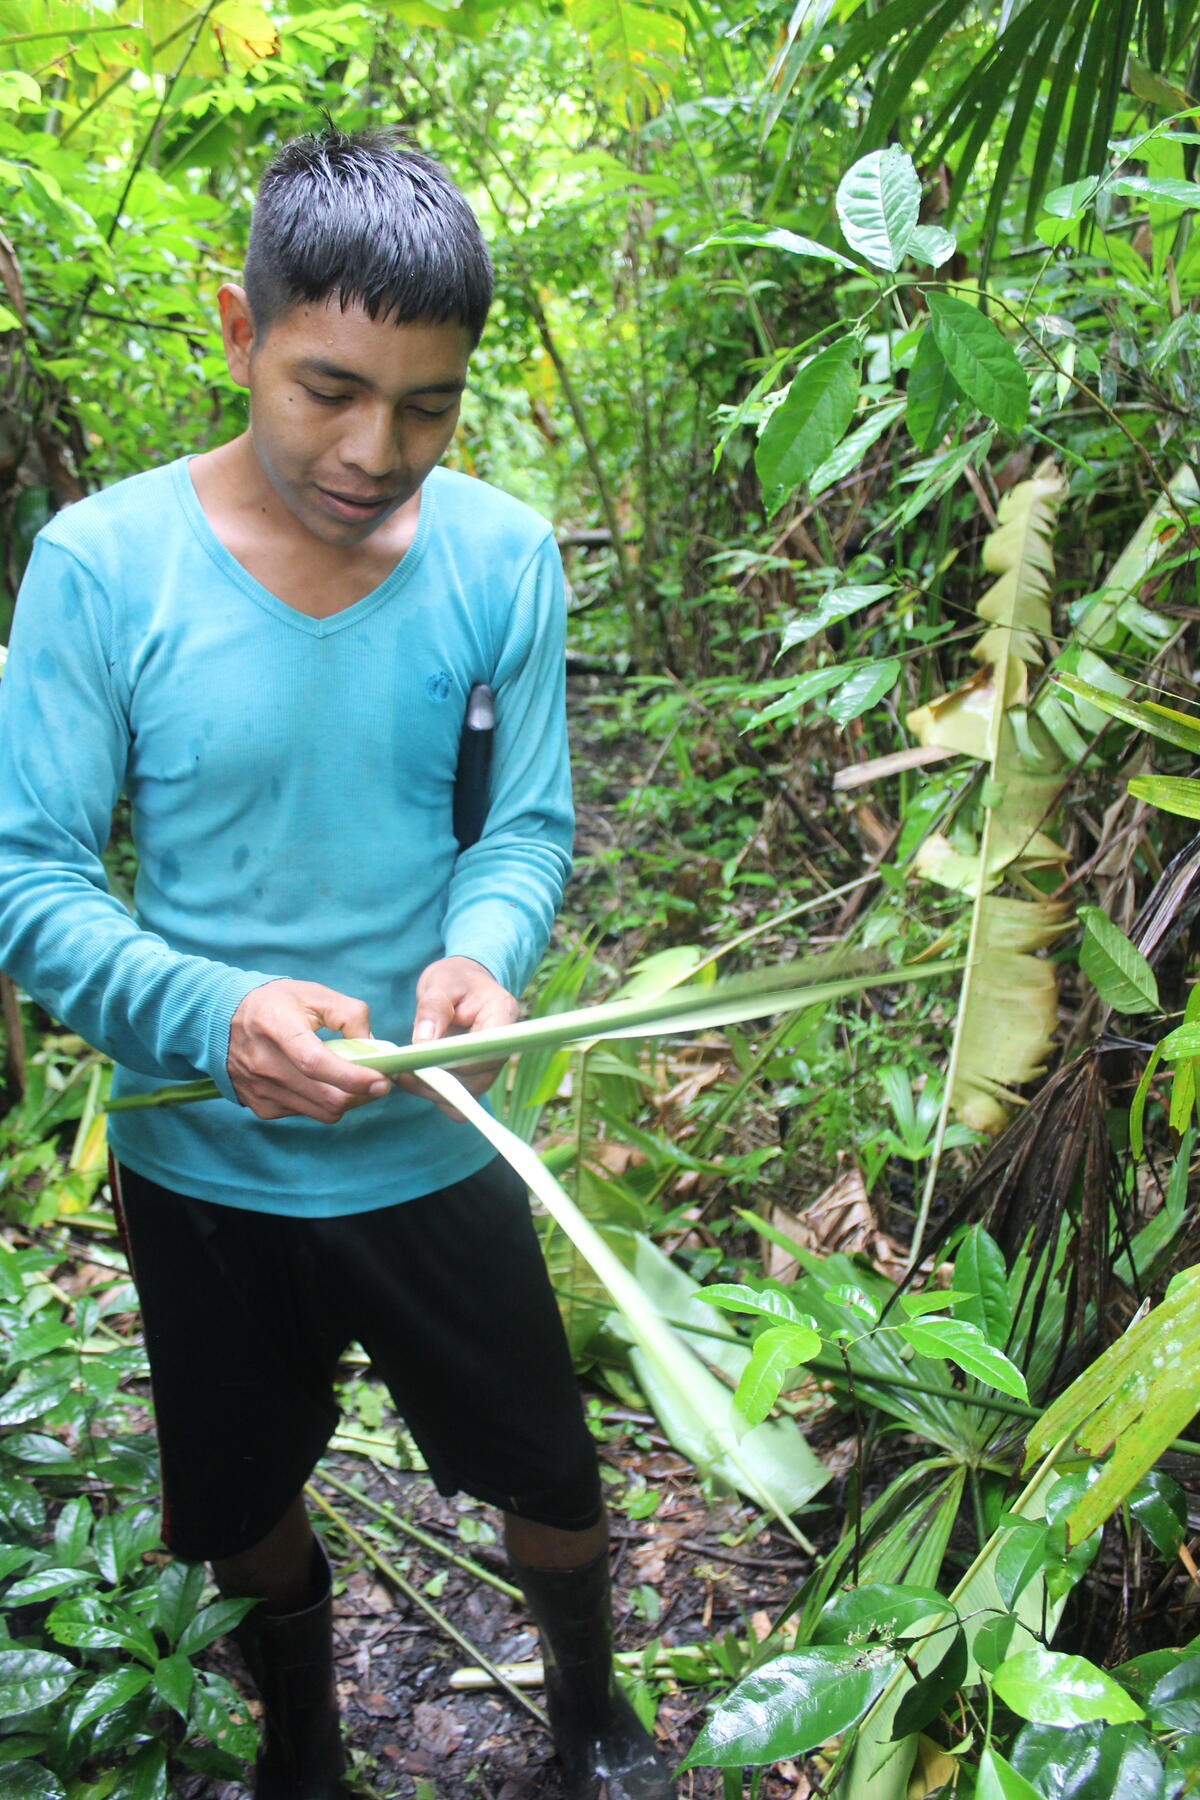 man in dense forest holding long leaves